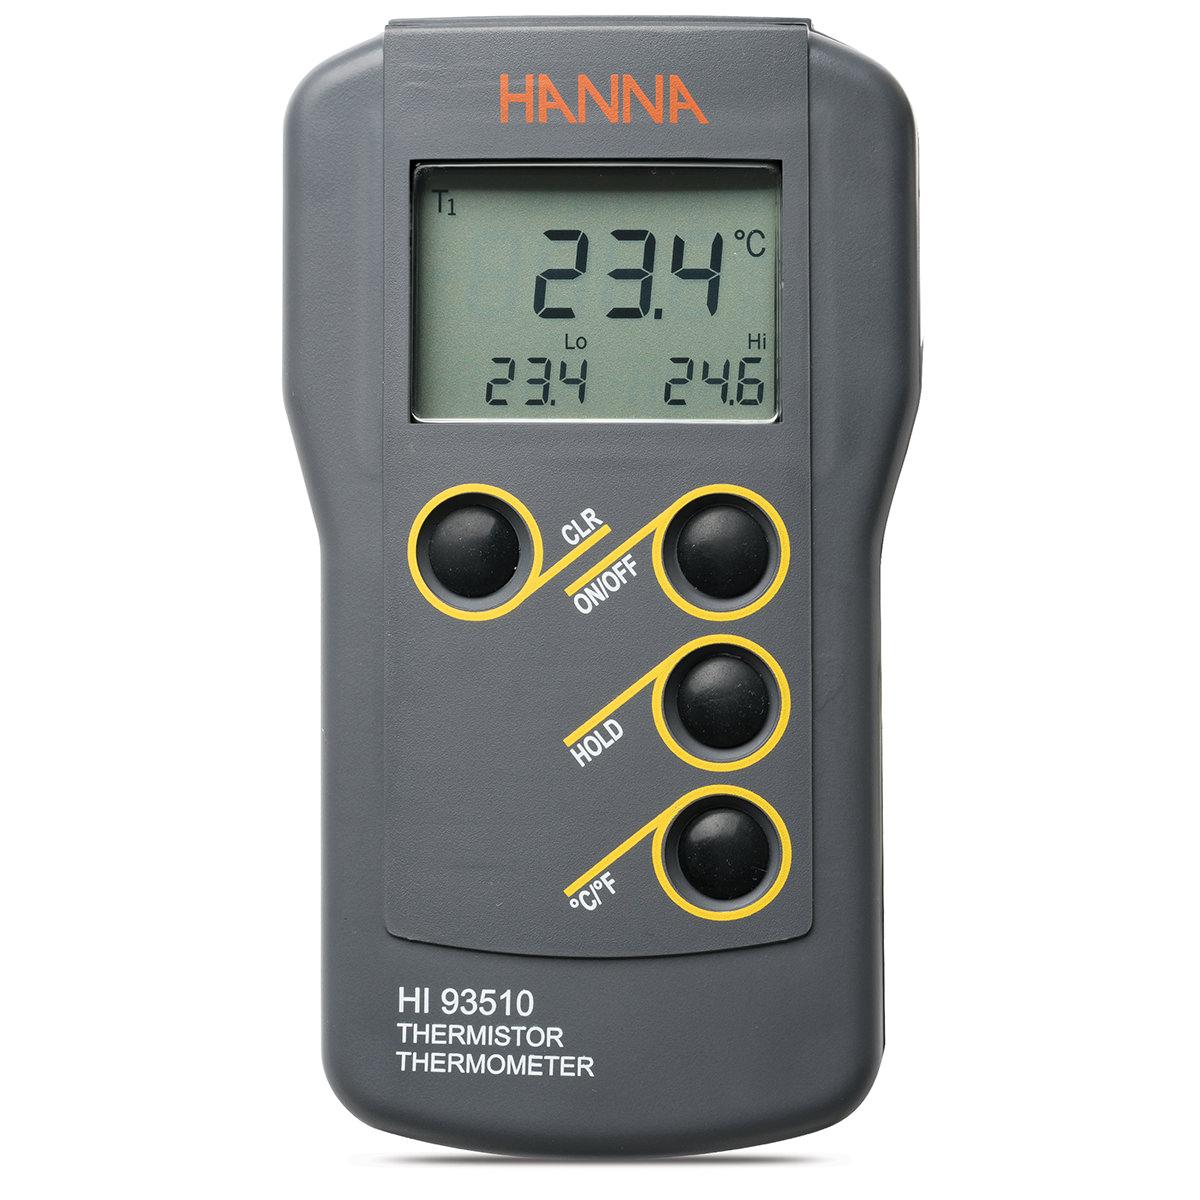 HI93510 Waterproof Thermistor Thermometer